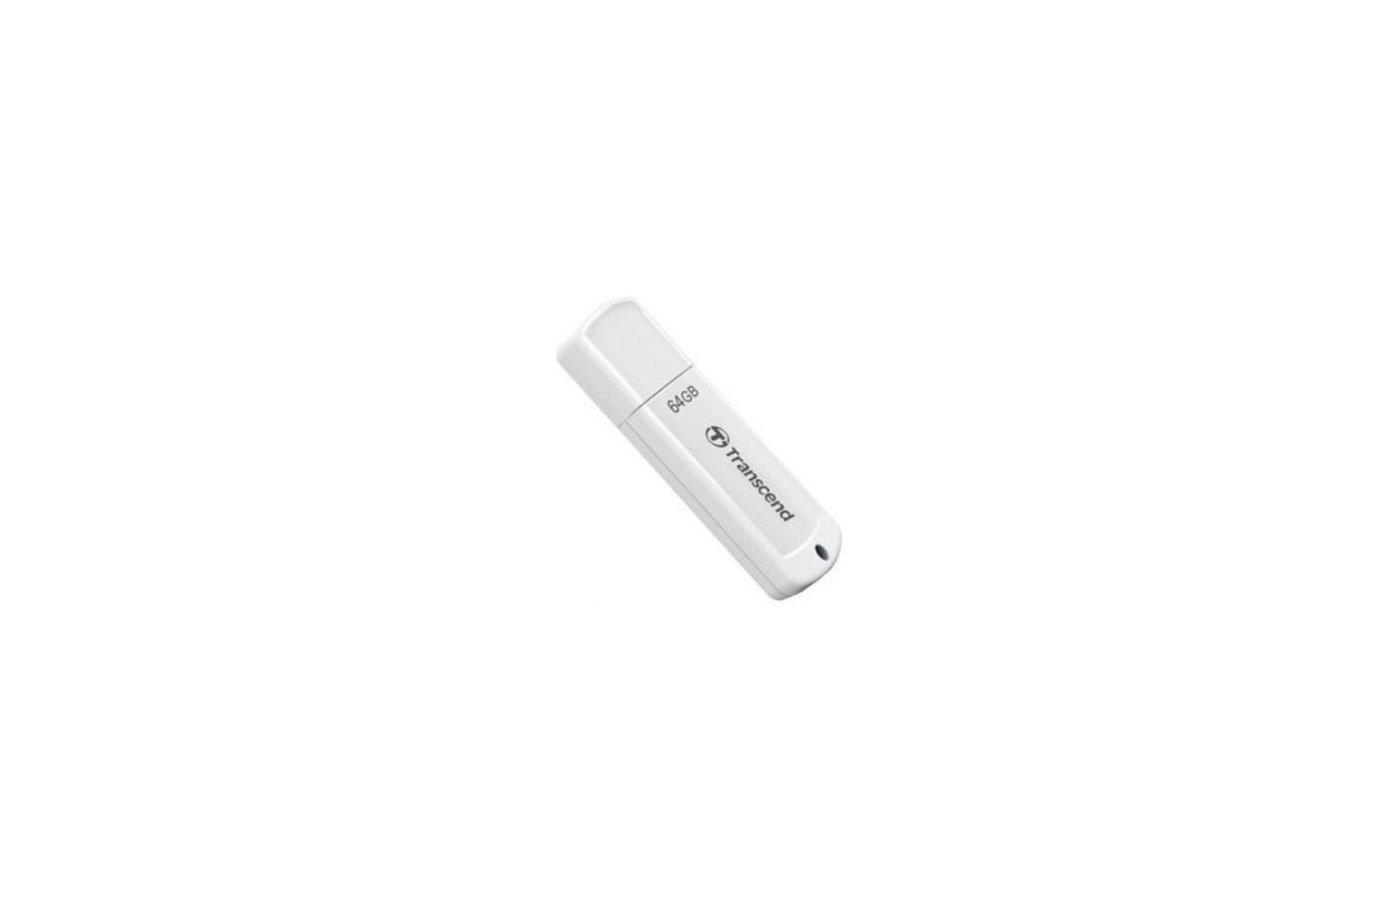 Флеш-диск USB 2.0 Transcend 64Gb JetFlash 370 TS64GJF370 белый